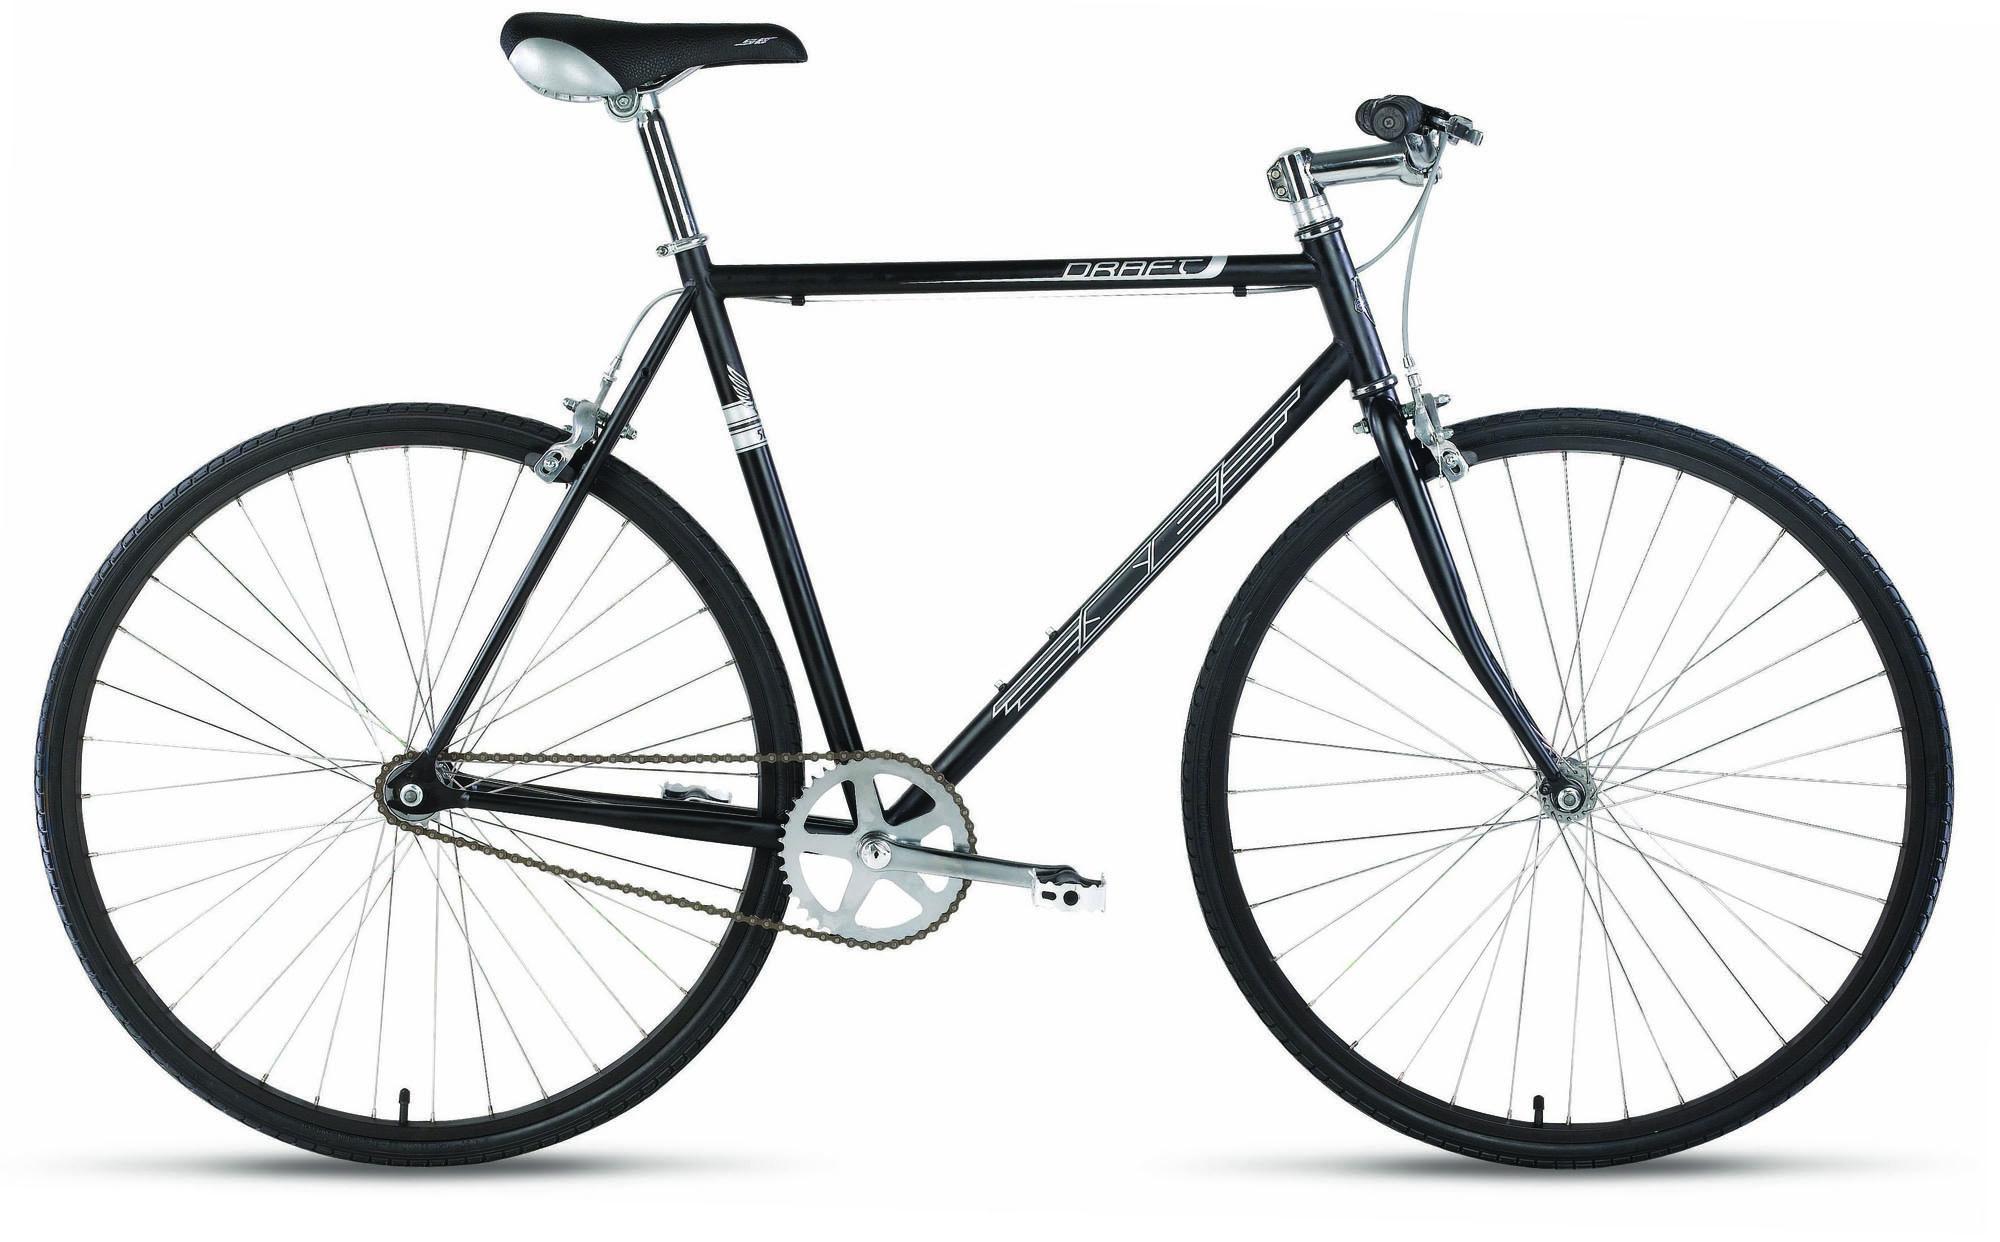 2009 SE Bikes 700c Draft